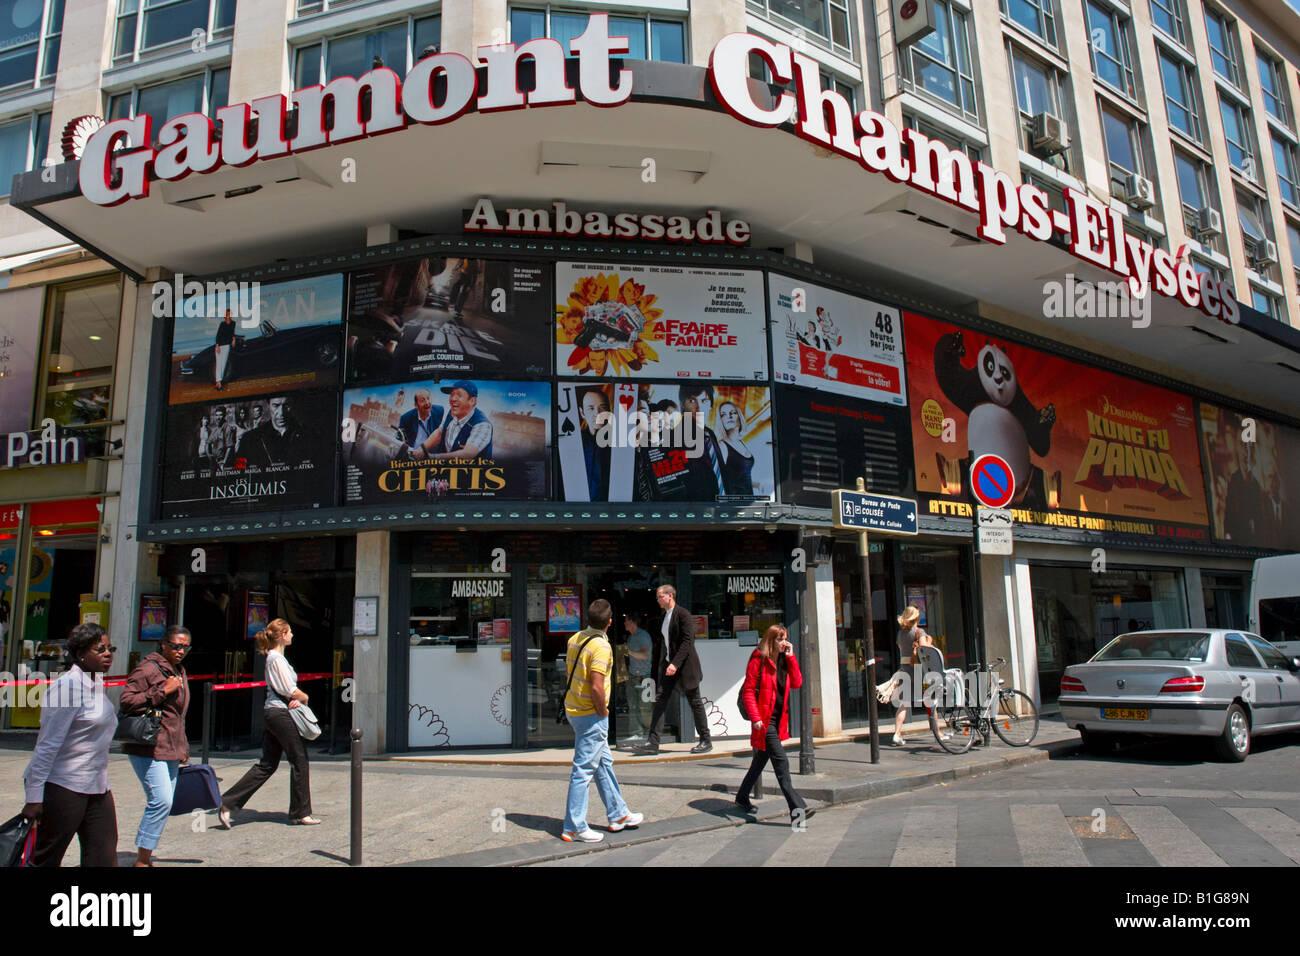 gaumont cinema champs elysees paris france stock photo royalty free image 18182801 alamy. Black Bedroom Furniture Sets. Home Design Ideas